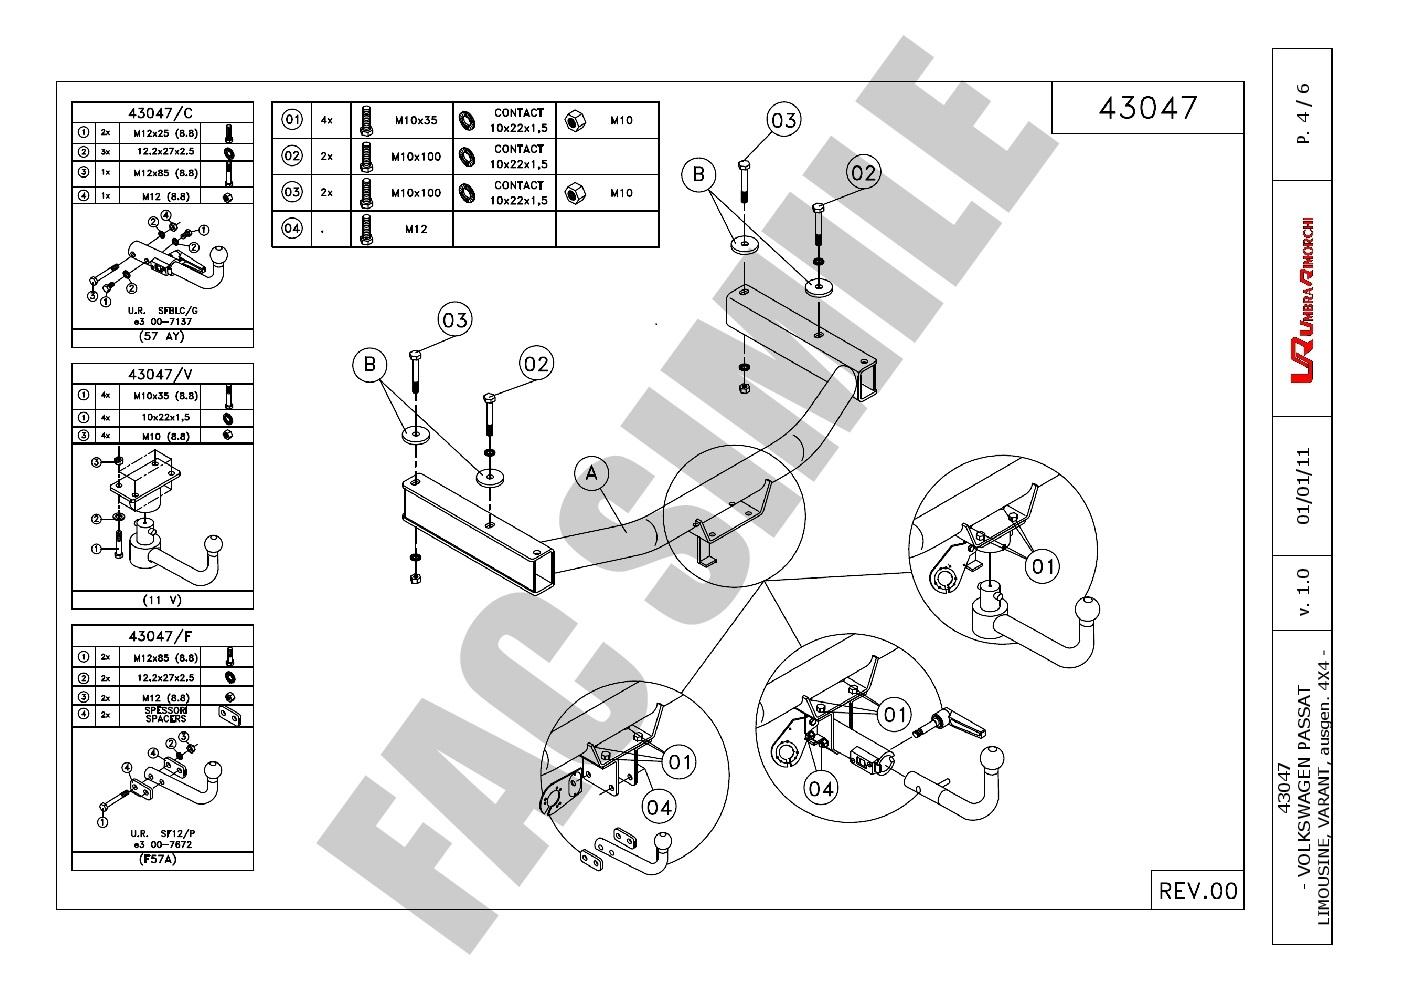 Bola de Remolque Fija para Ssangyong Rexton 4WD Restyling 2002-2017 34202//F/_B2